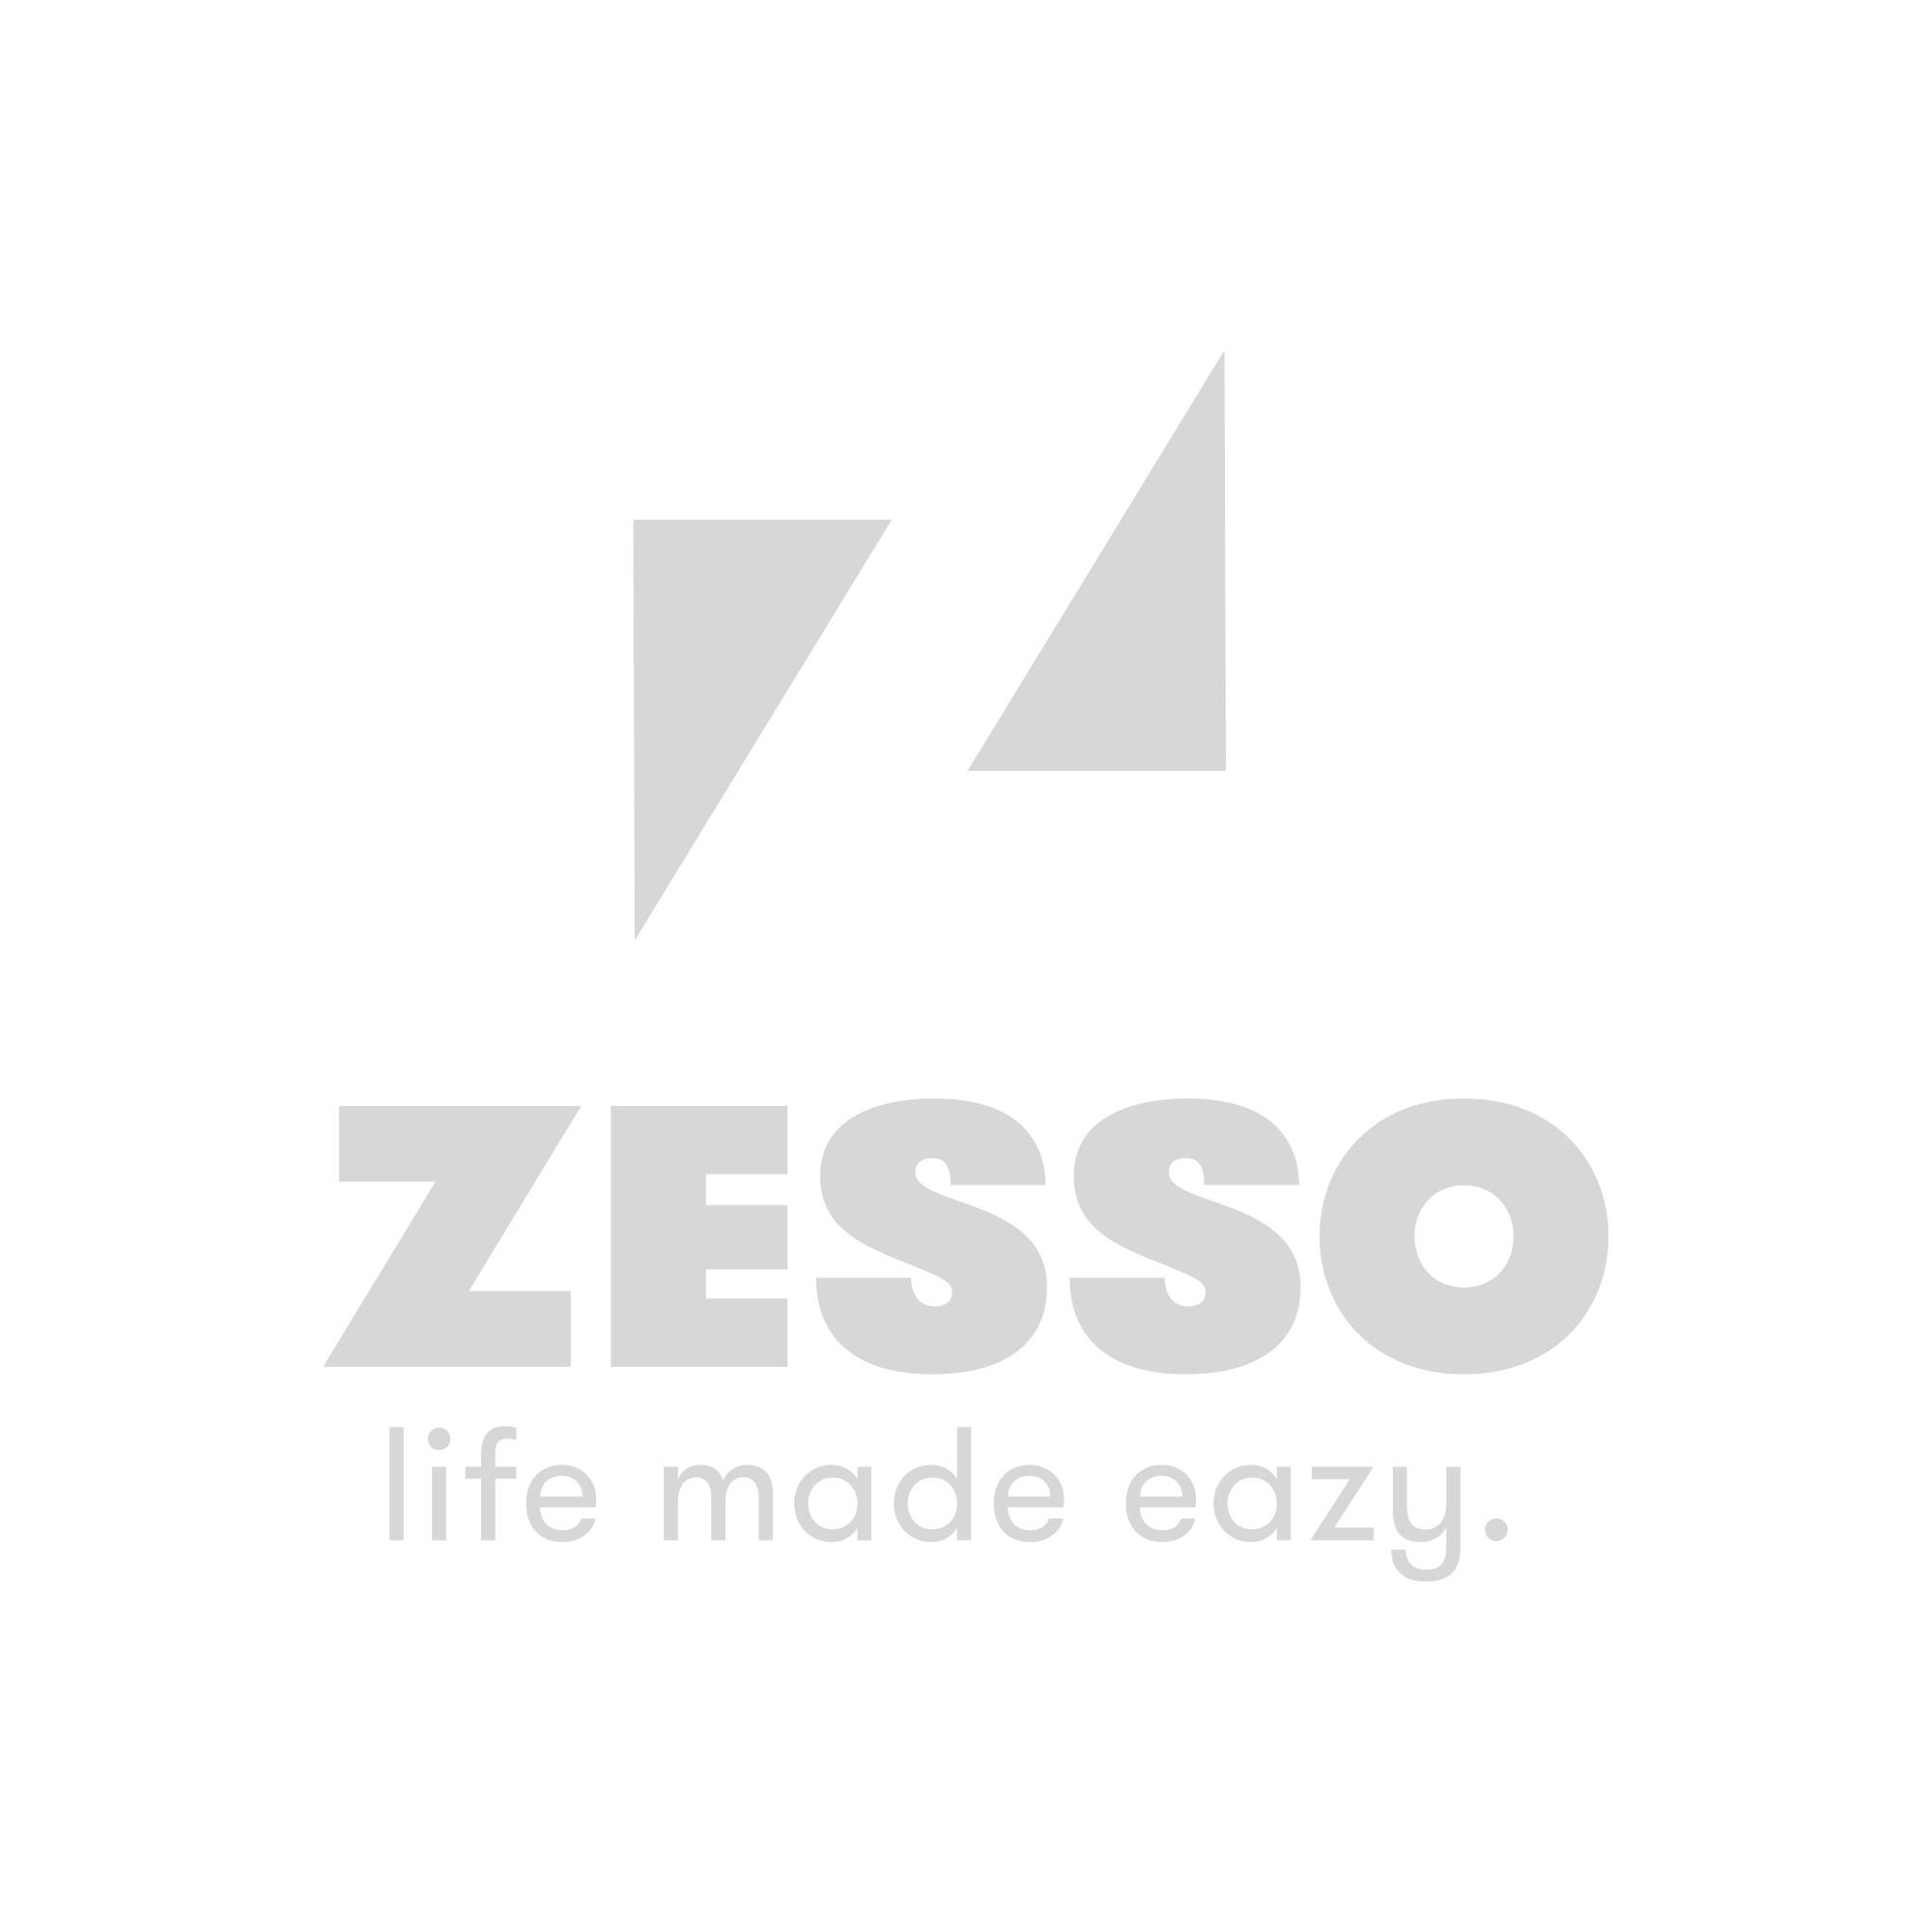 Ferrari F12 Berlinetta Elektrische Kinderauto 3 - 8 Jaar 6 V Geel